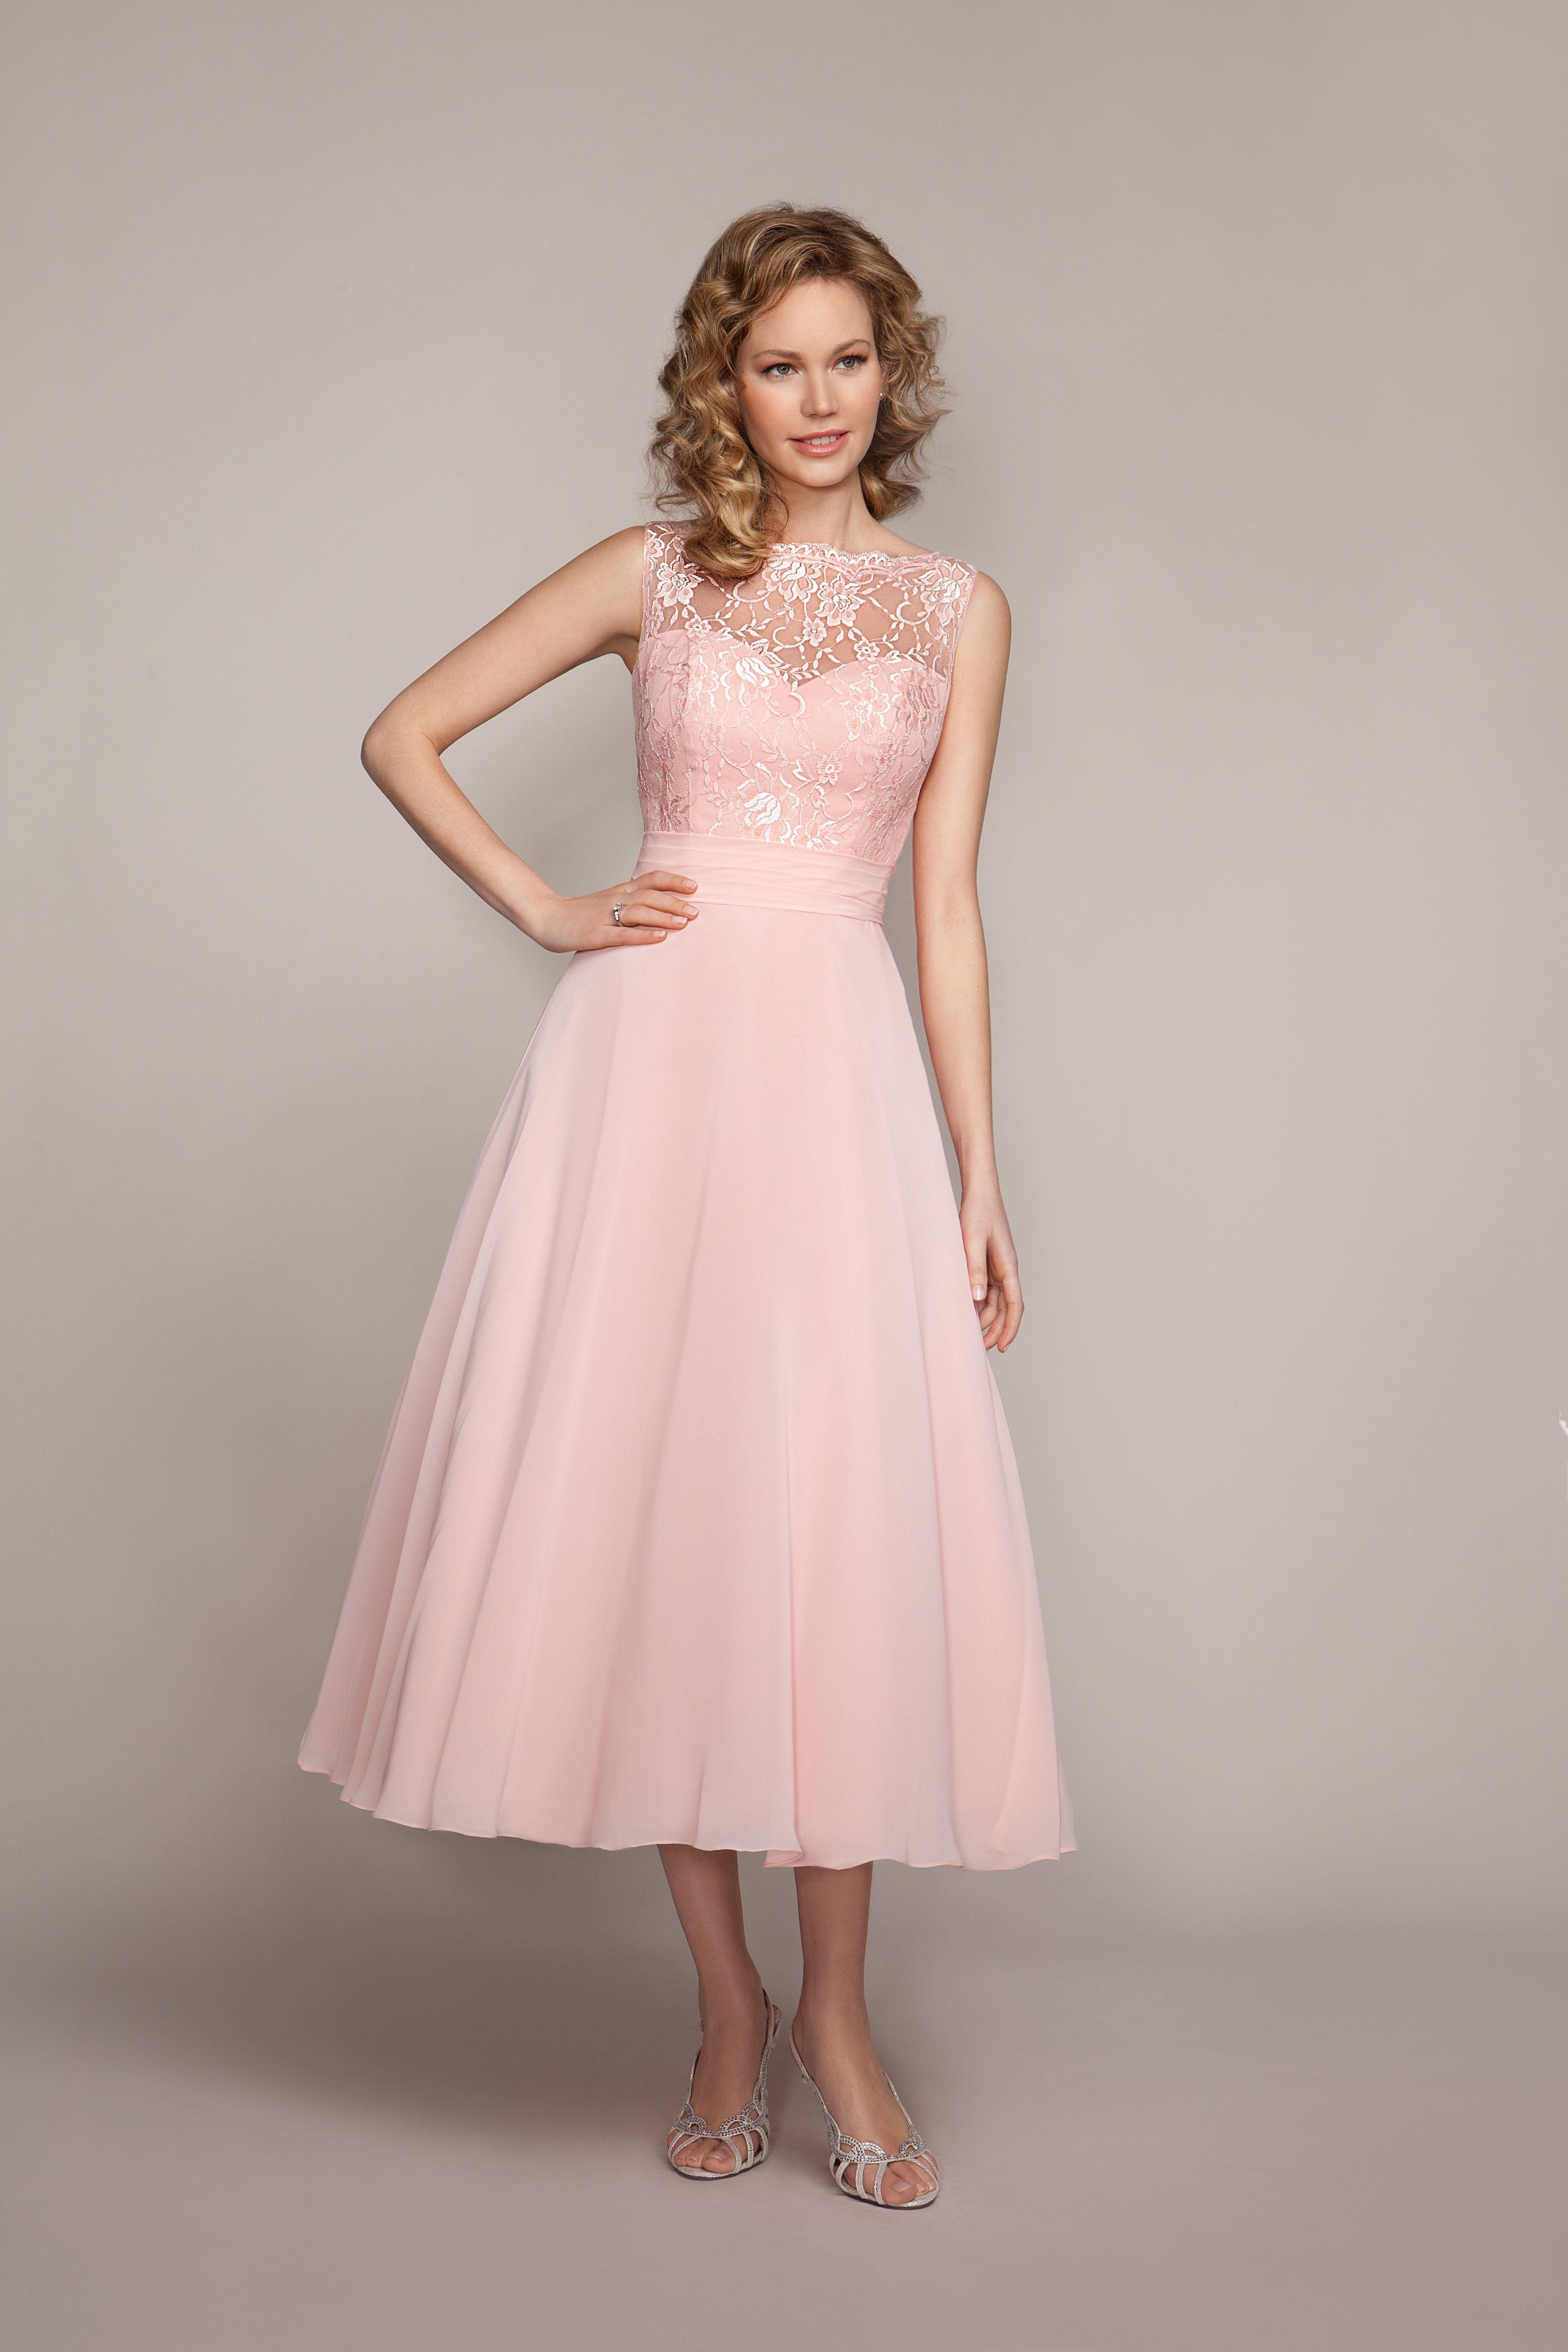 Mark lesley 1525a bridesmaid dress bridesmaid dresses pinterest explore pink bridesmaid dresses tea length and more ombrellifo Images